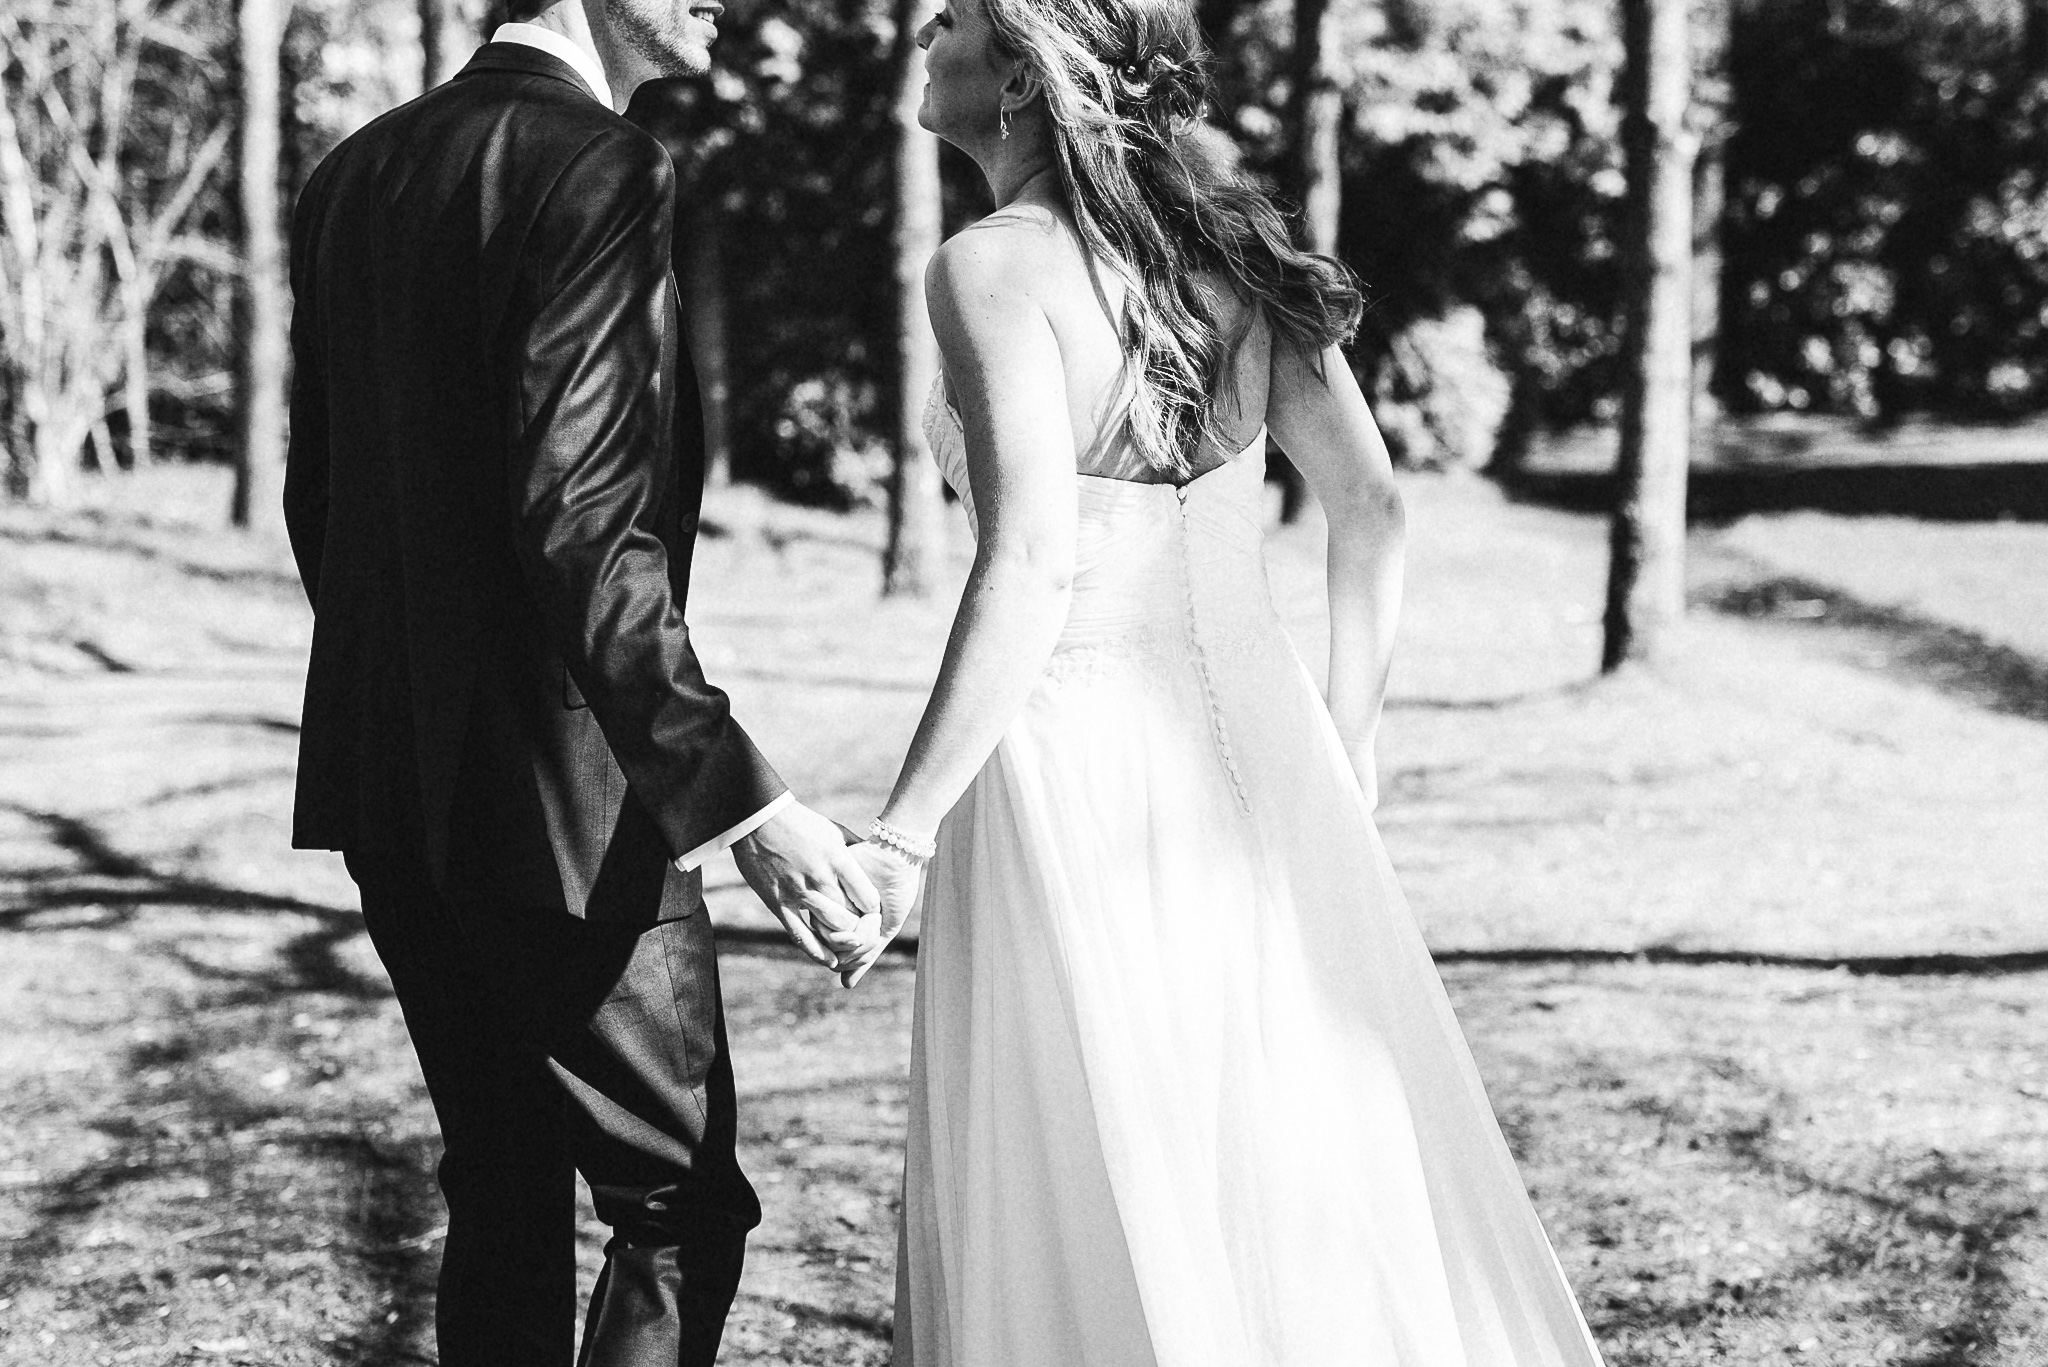 14 van 51 - trouwfotografie-gelske-reinier-friesland - 0117